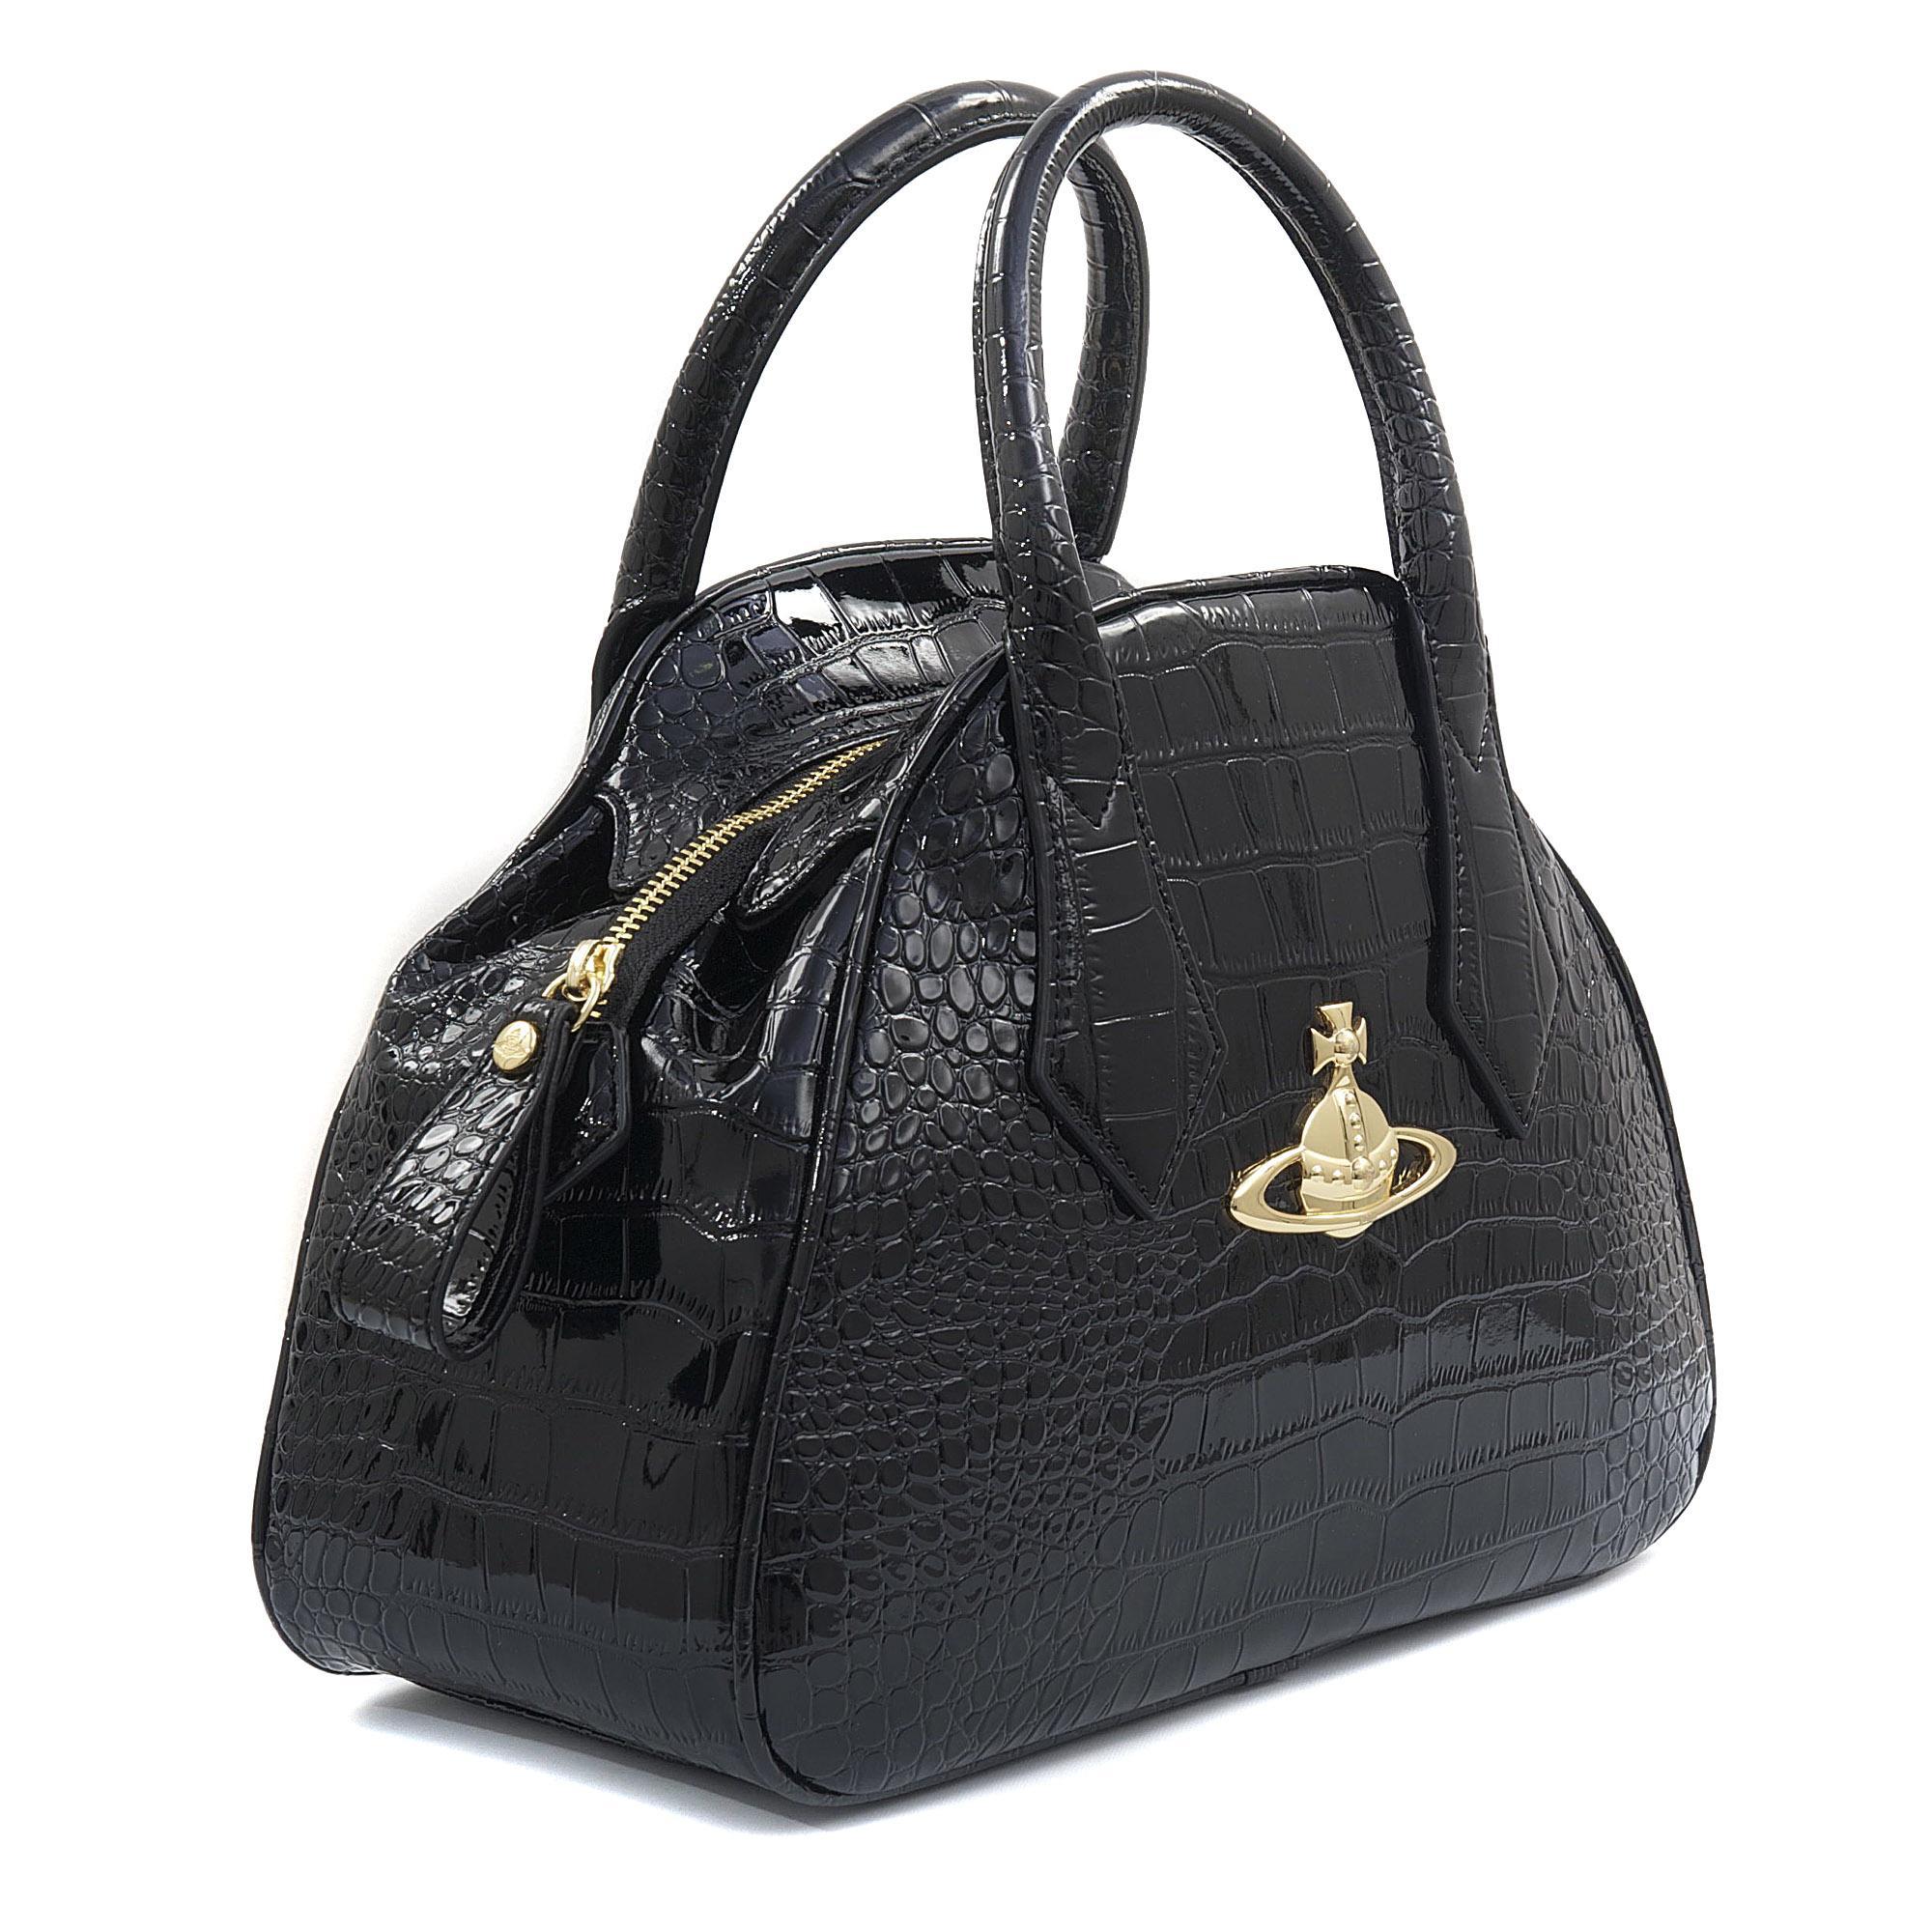 Yasmin New Chancery Bag